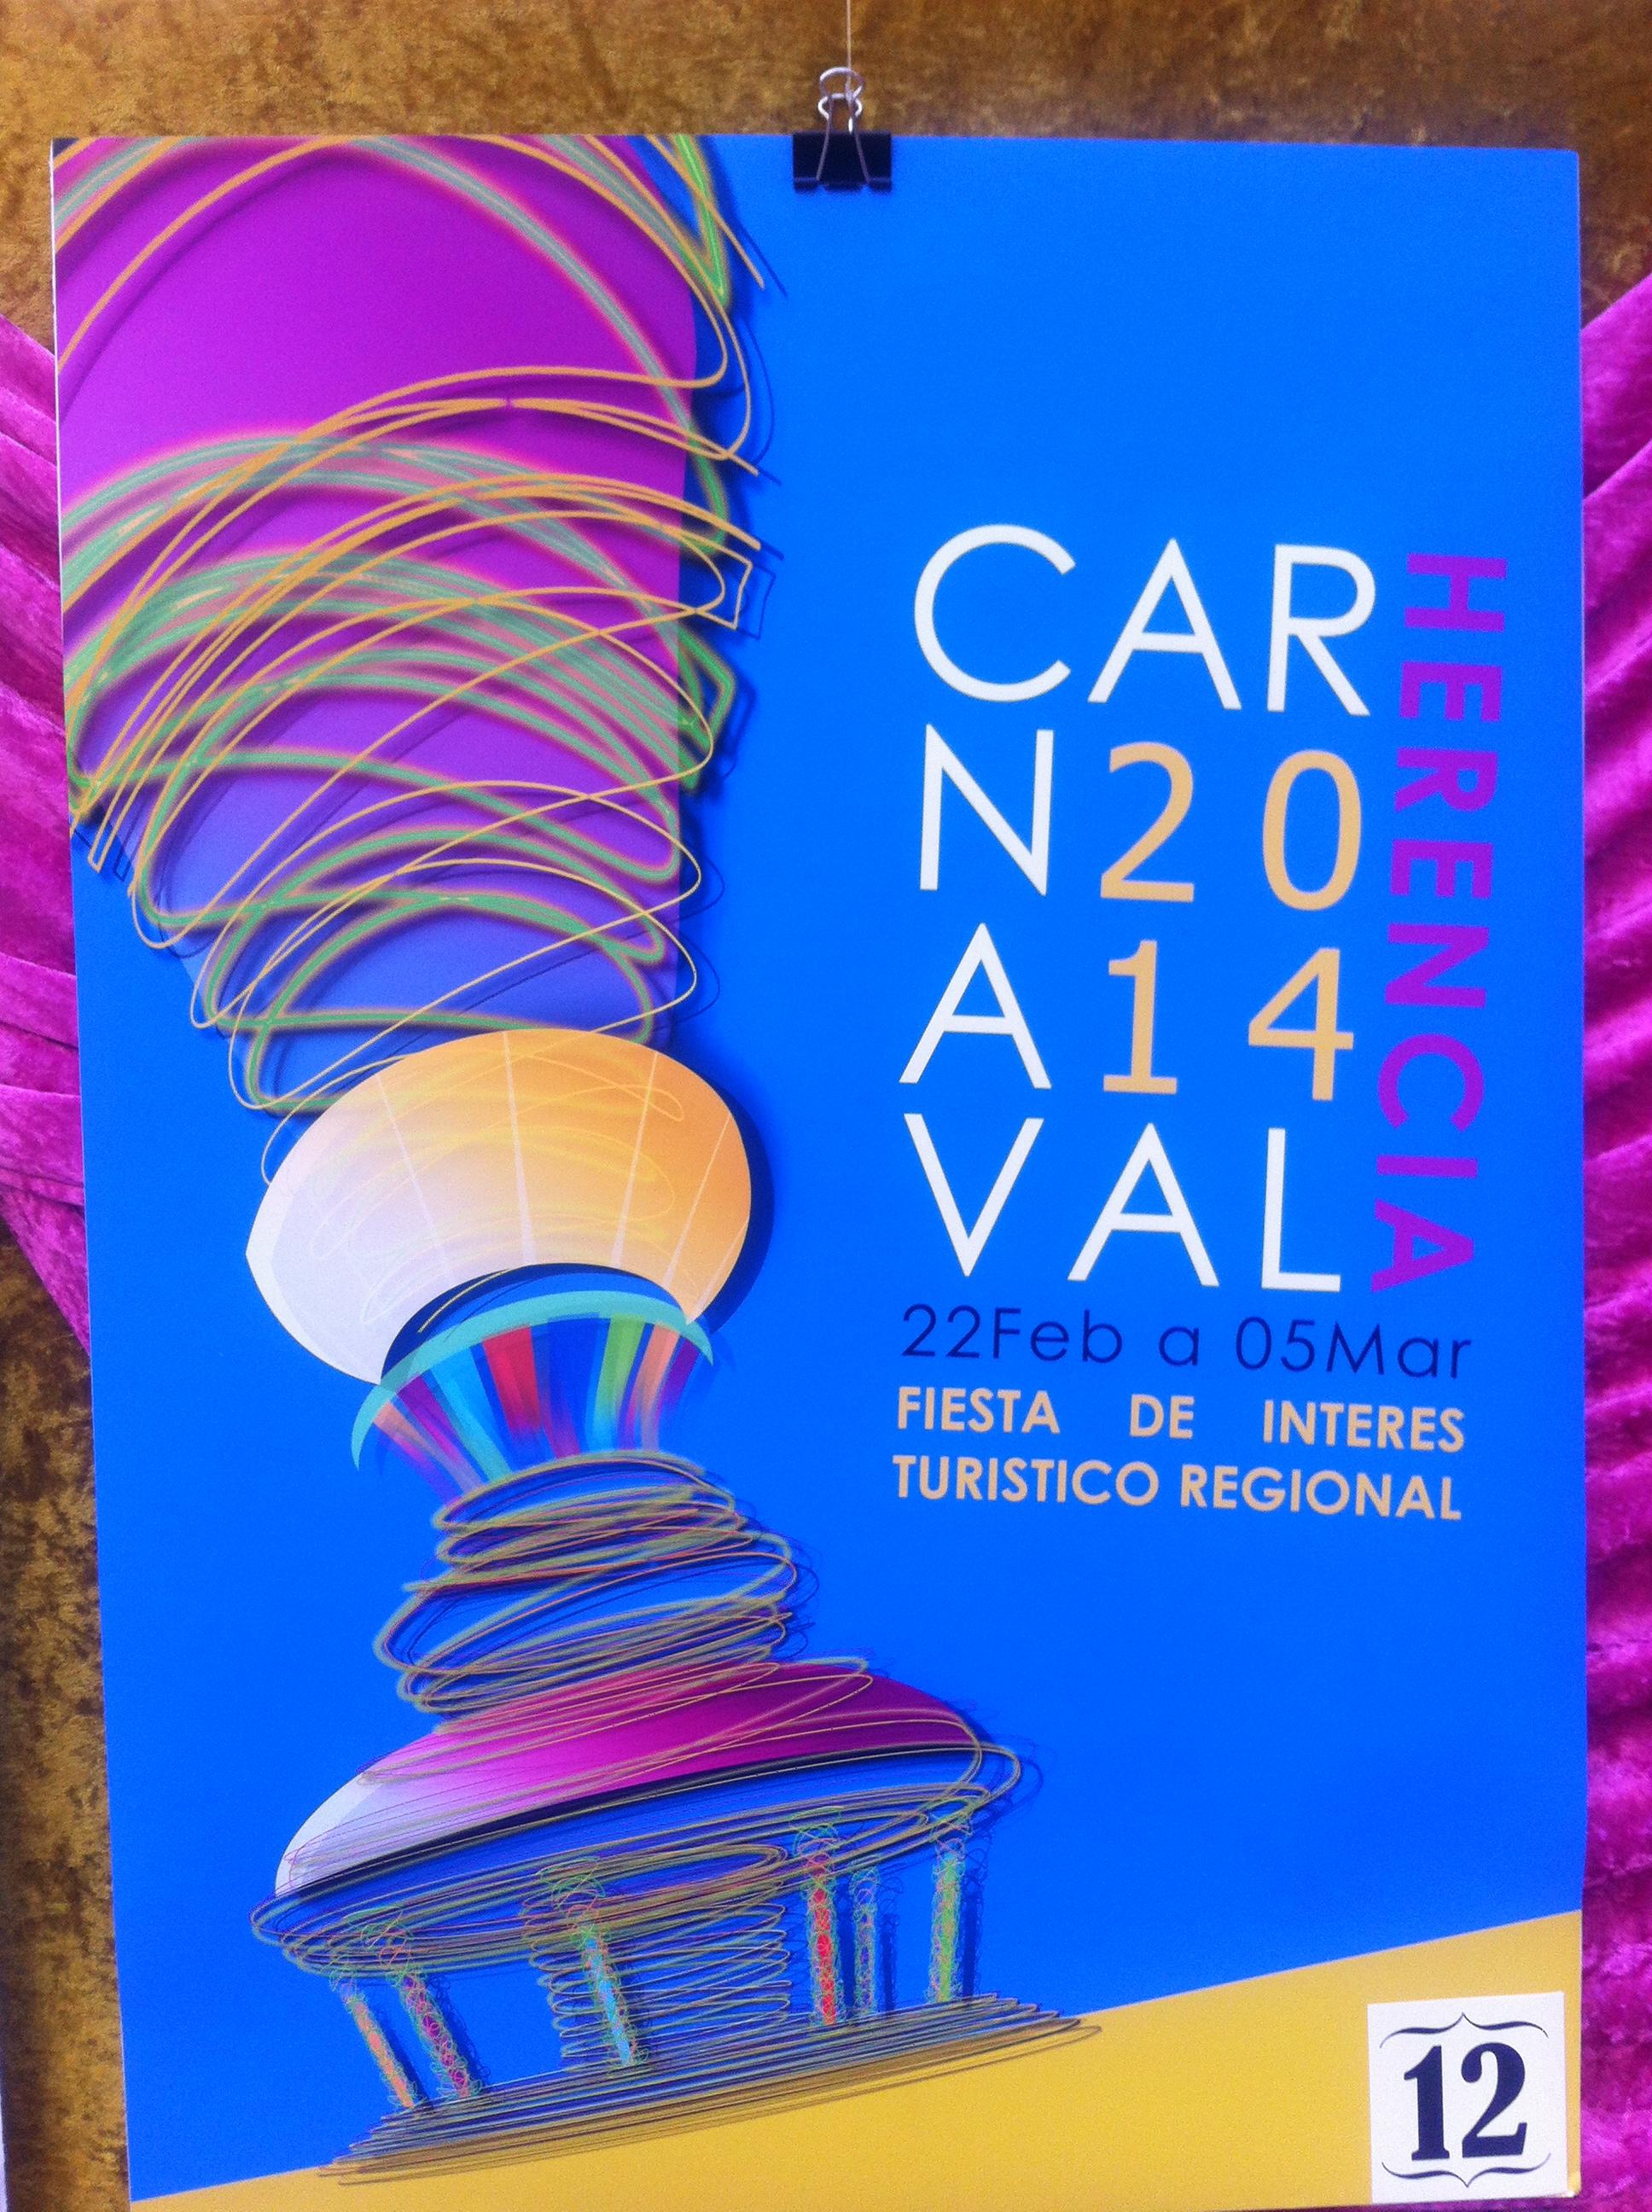 Concurso Carteles Carnaval 2014 (12)